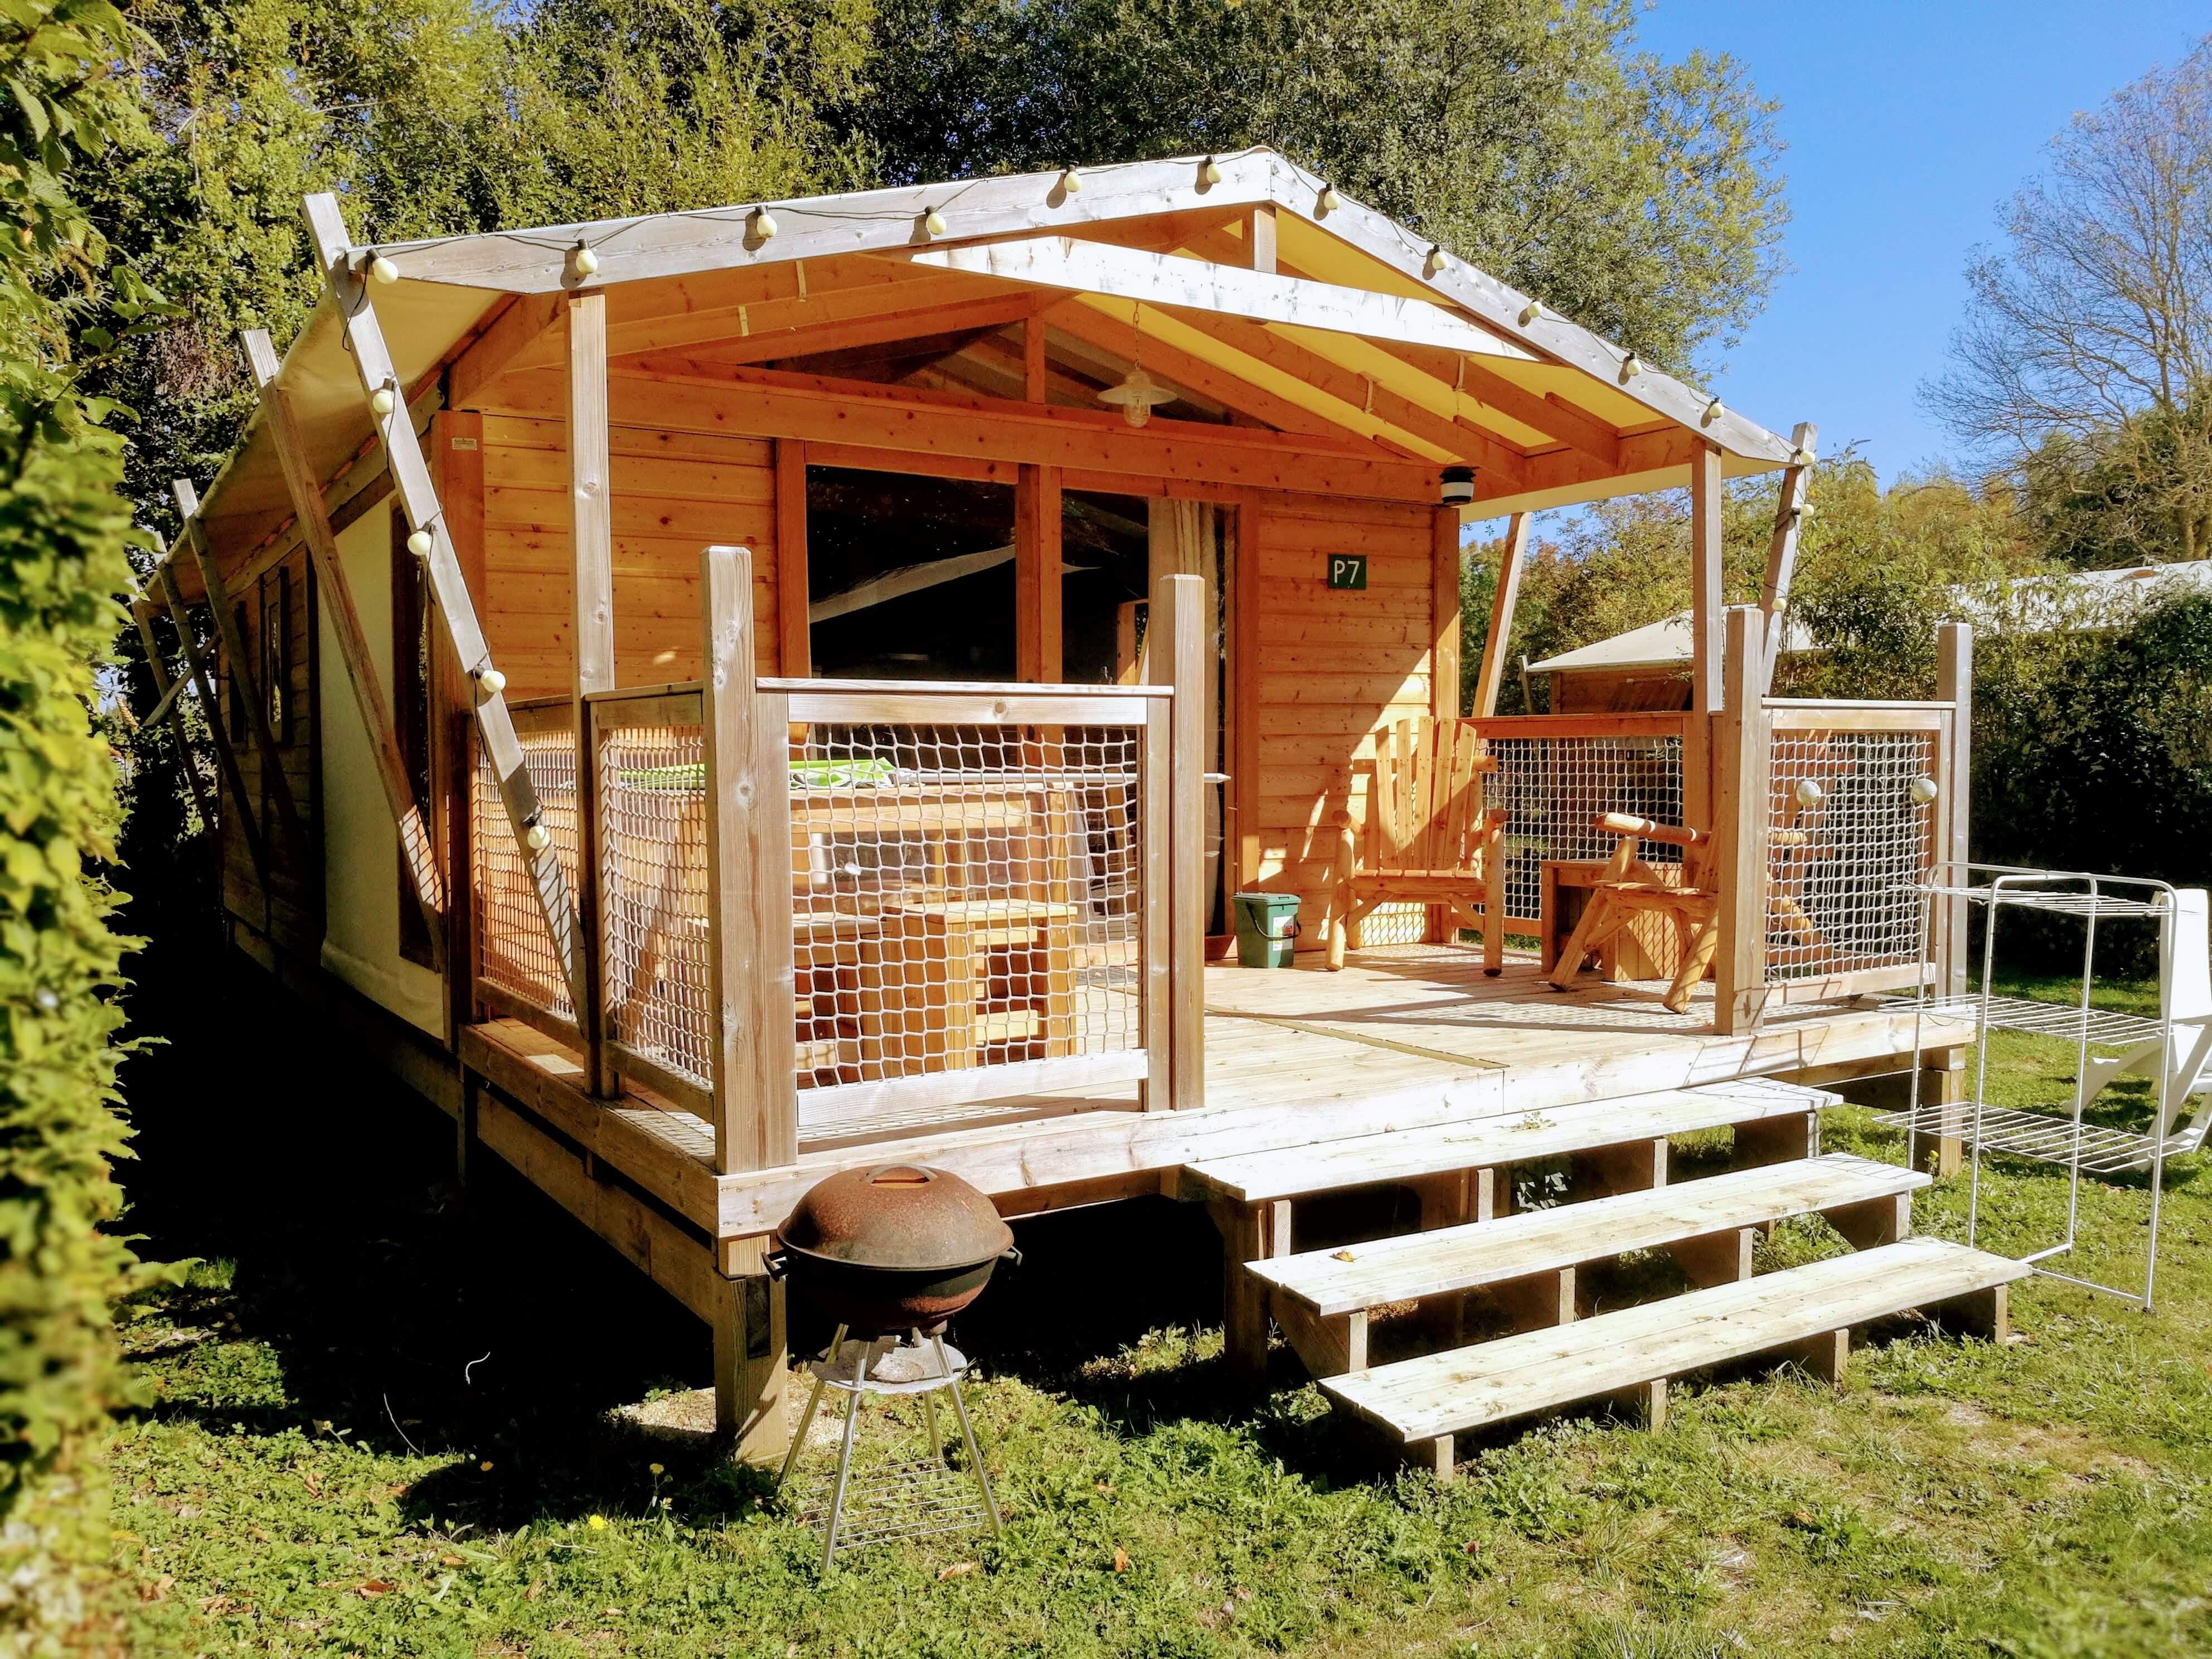 Camping **** Domaine de l'Etang à Brissac Quincé